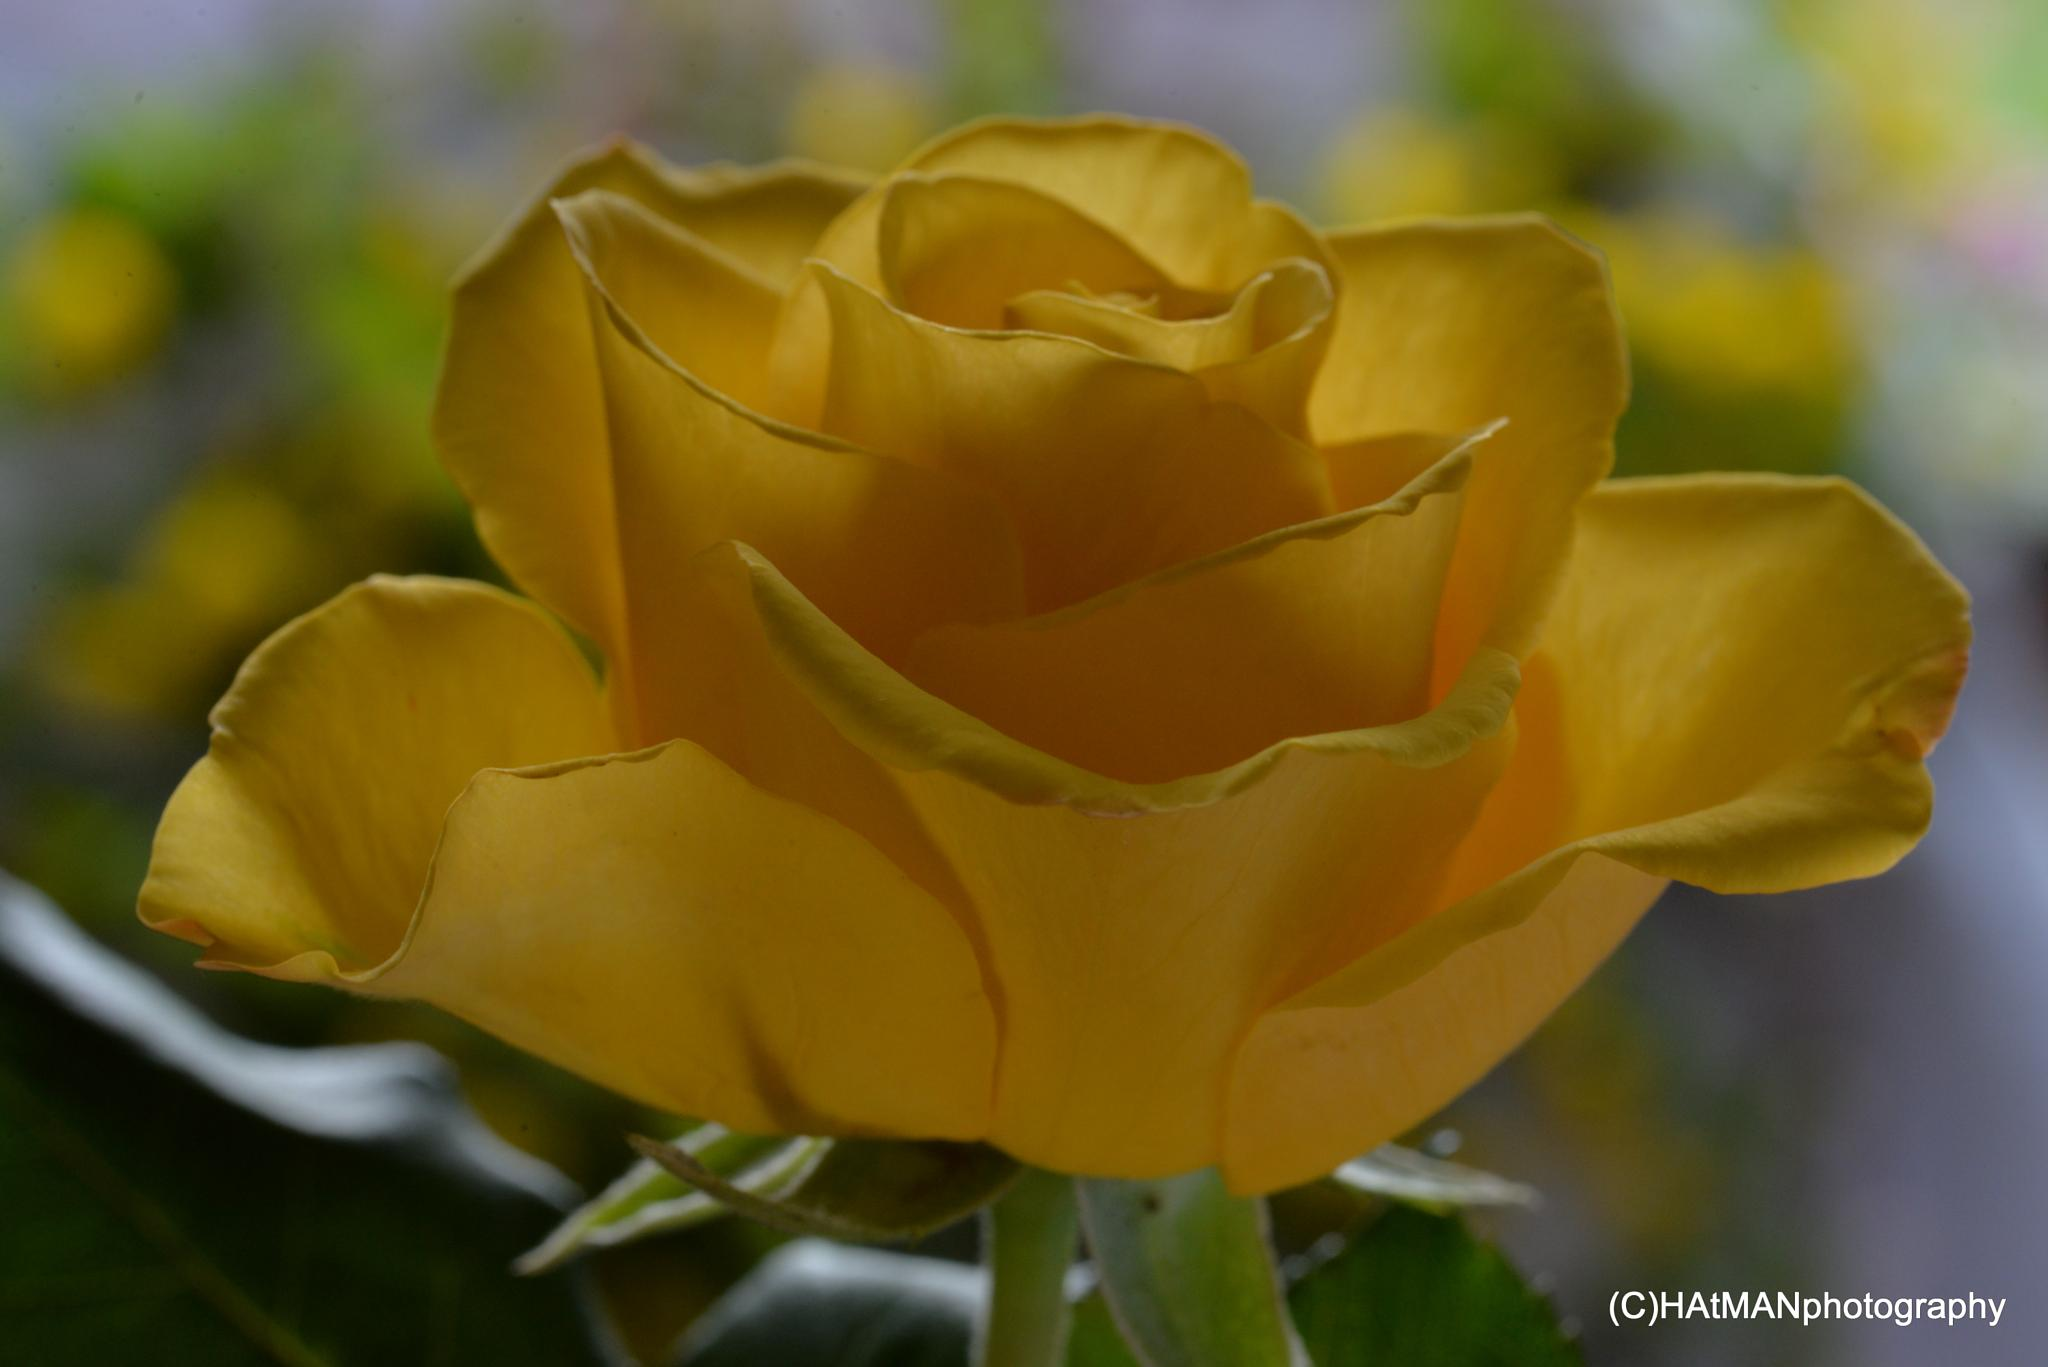 Rose by HeikkiHAtMAN PHOTOGRAPHY